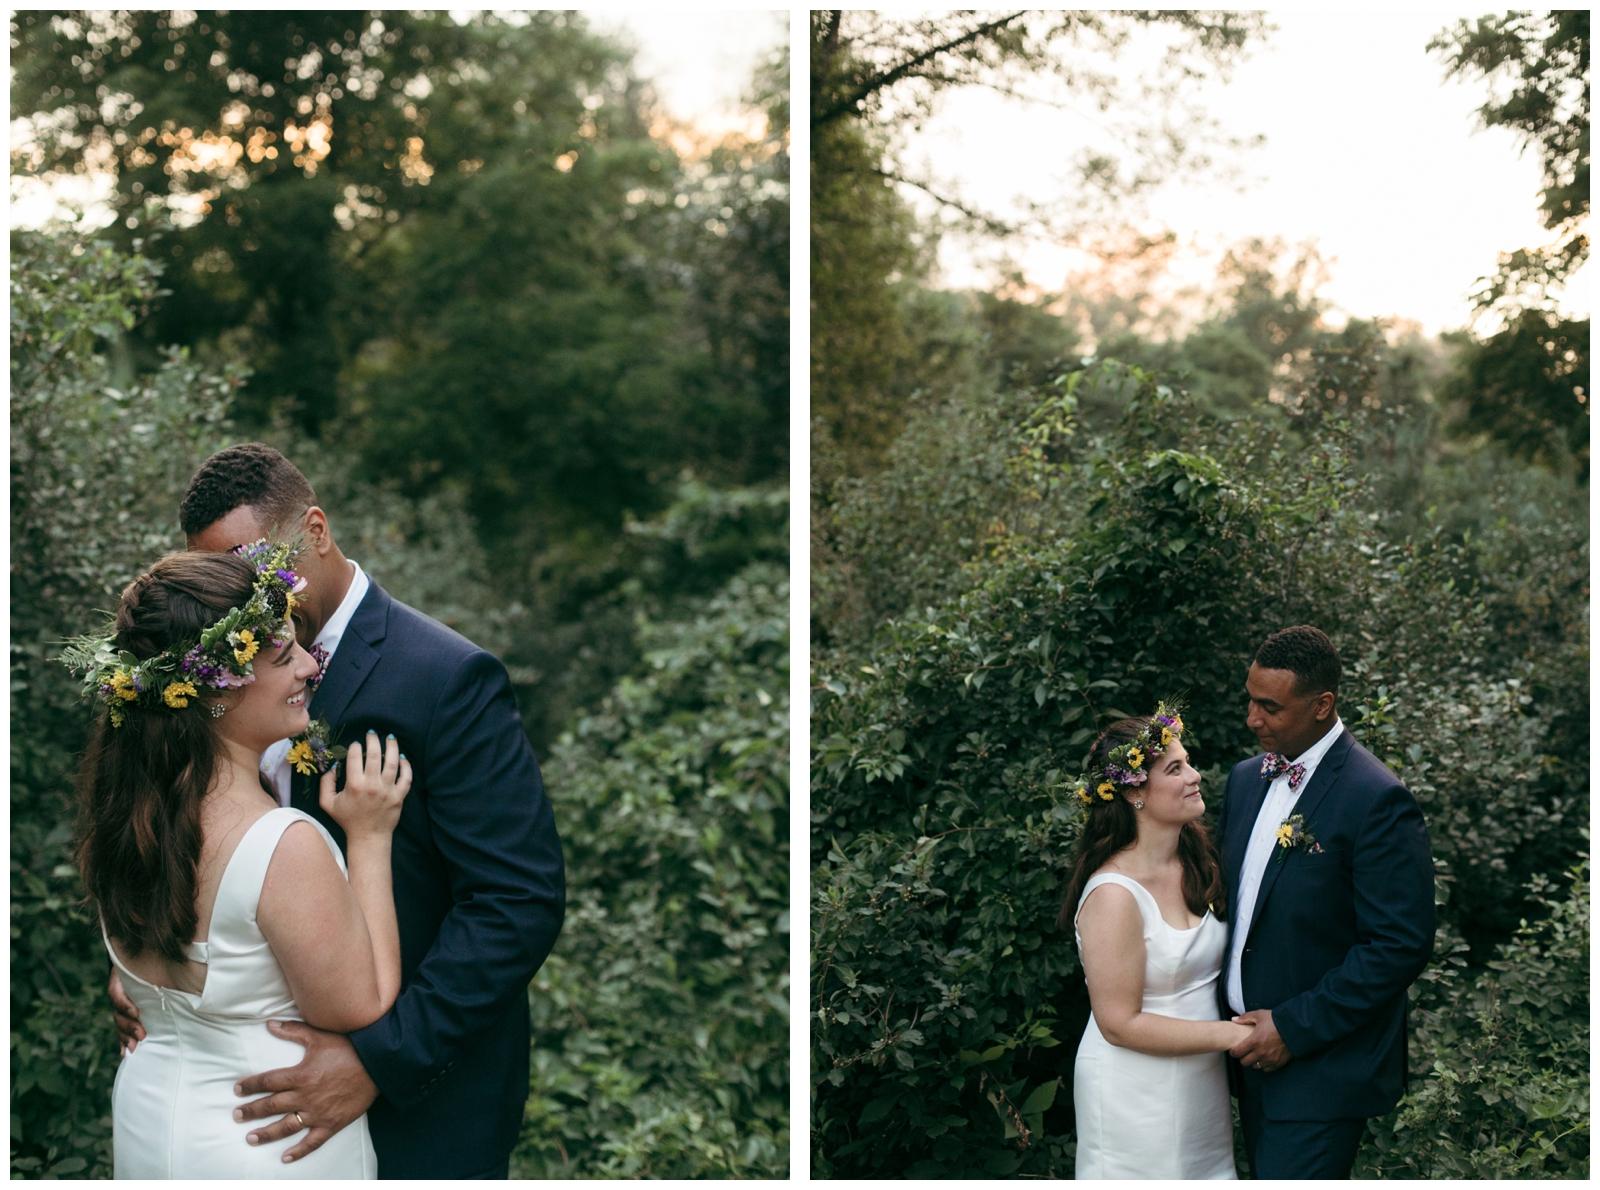 Bailey-Q-Photo-Connors-Center-Wedding-Boston-Wedding-Photographer-098.jpg